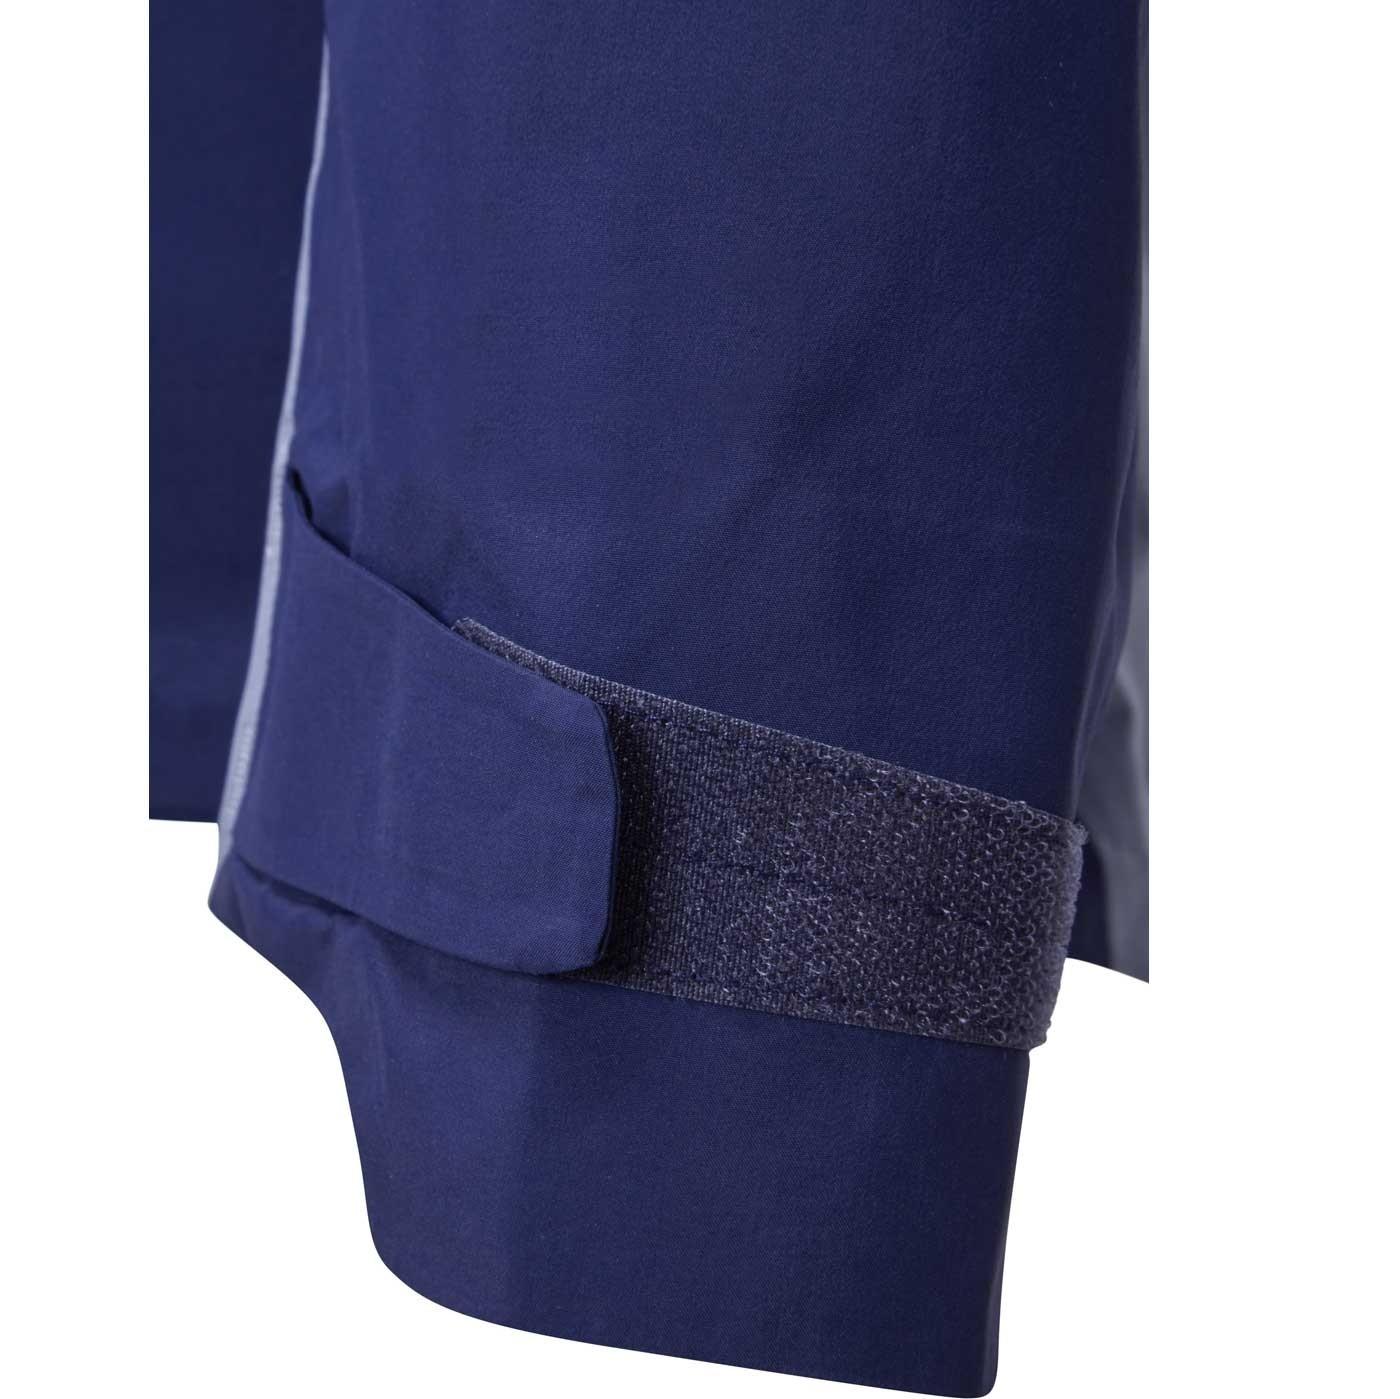 Rab Muztag GTX Waterproof Jacket - Women's - Blueprint/Thistle